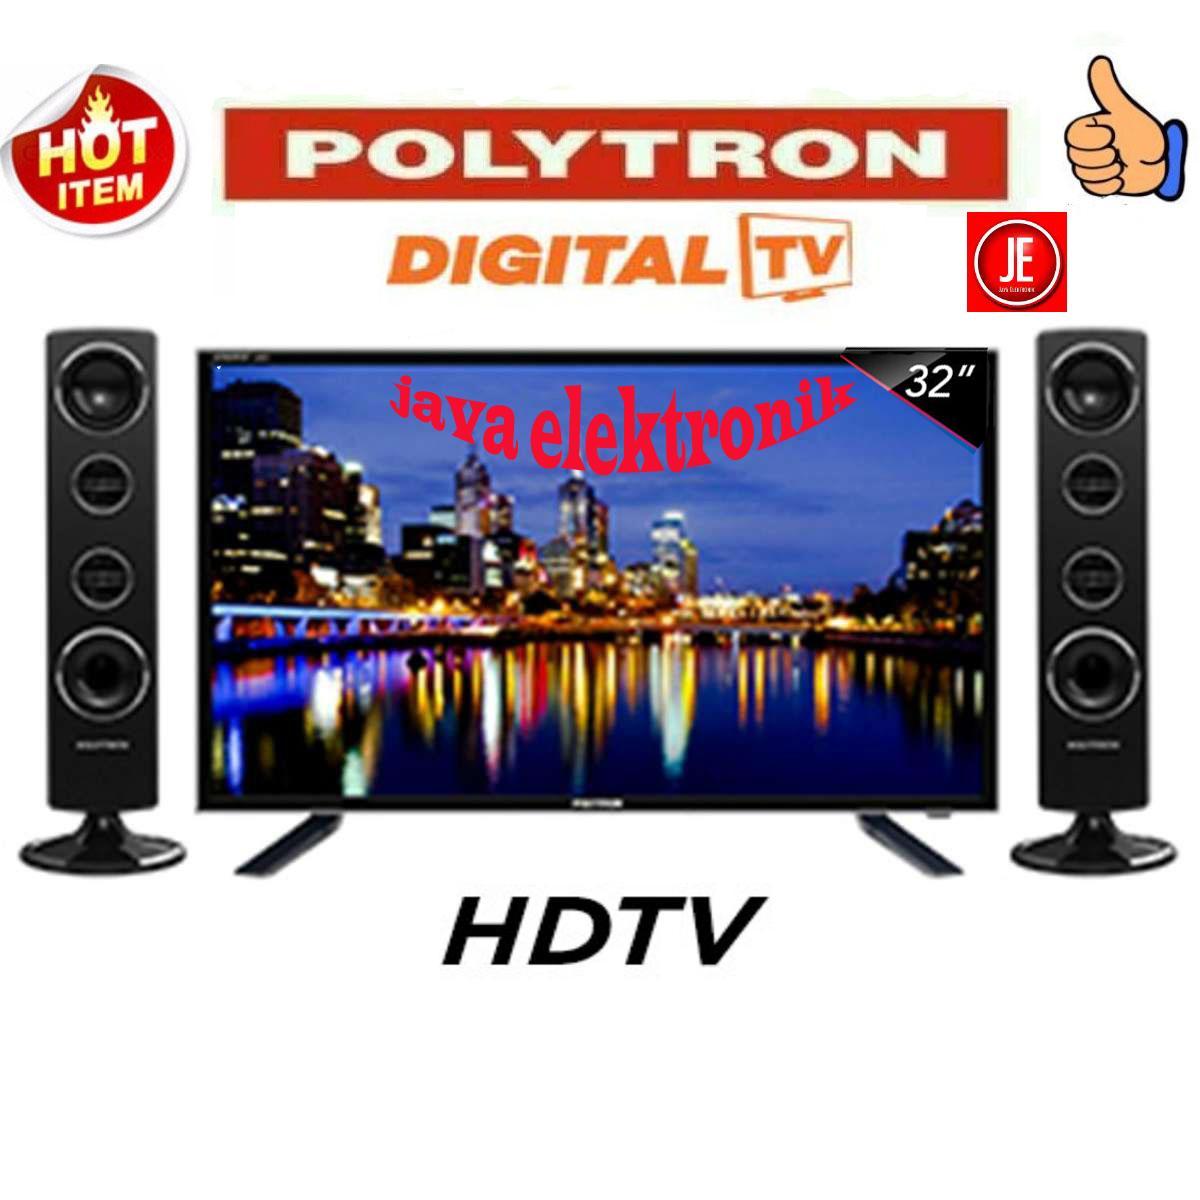 POLYTRON LED TV 32 Inch HD - PLD32TS1503 digital tv+Speaker Tower garansi resmi